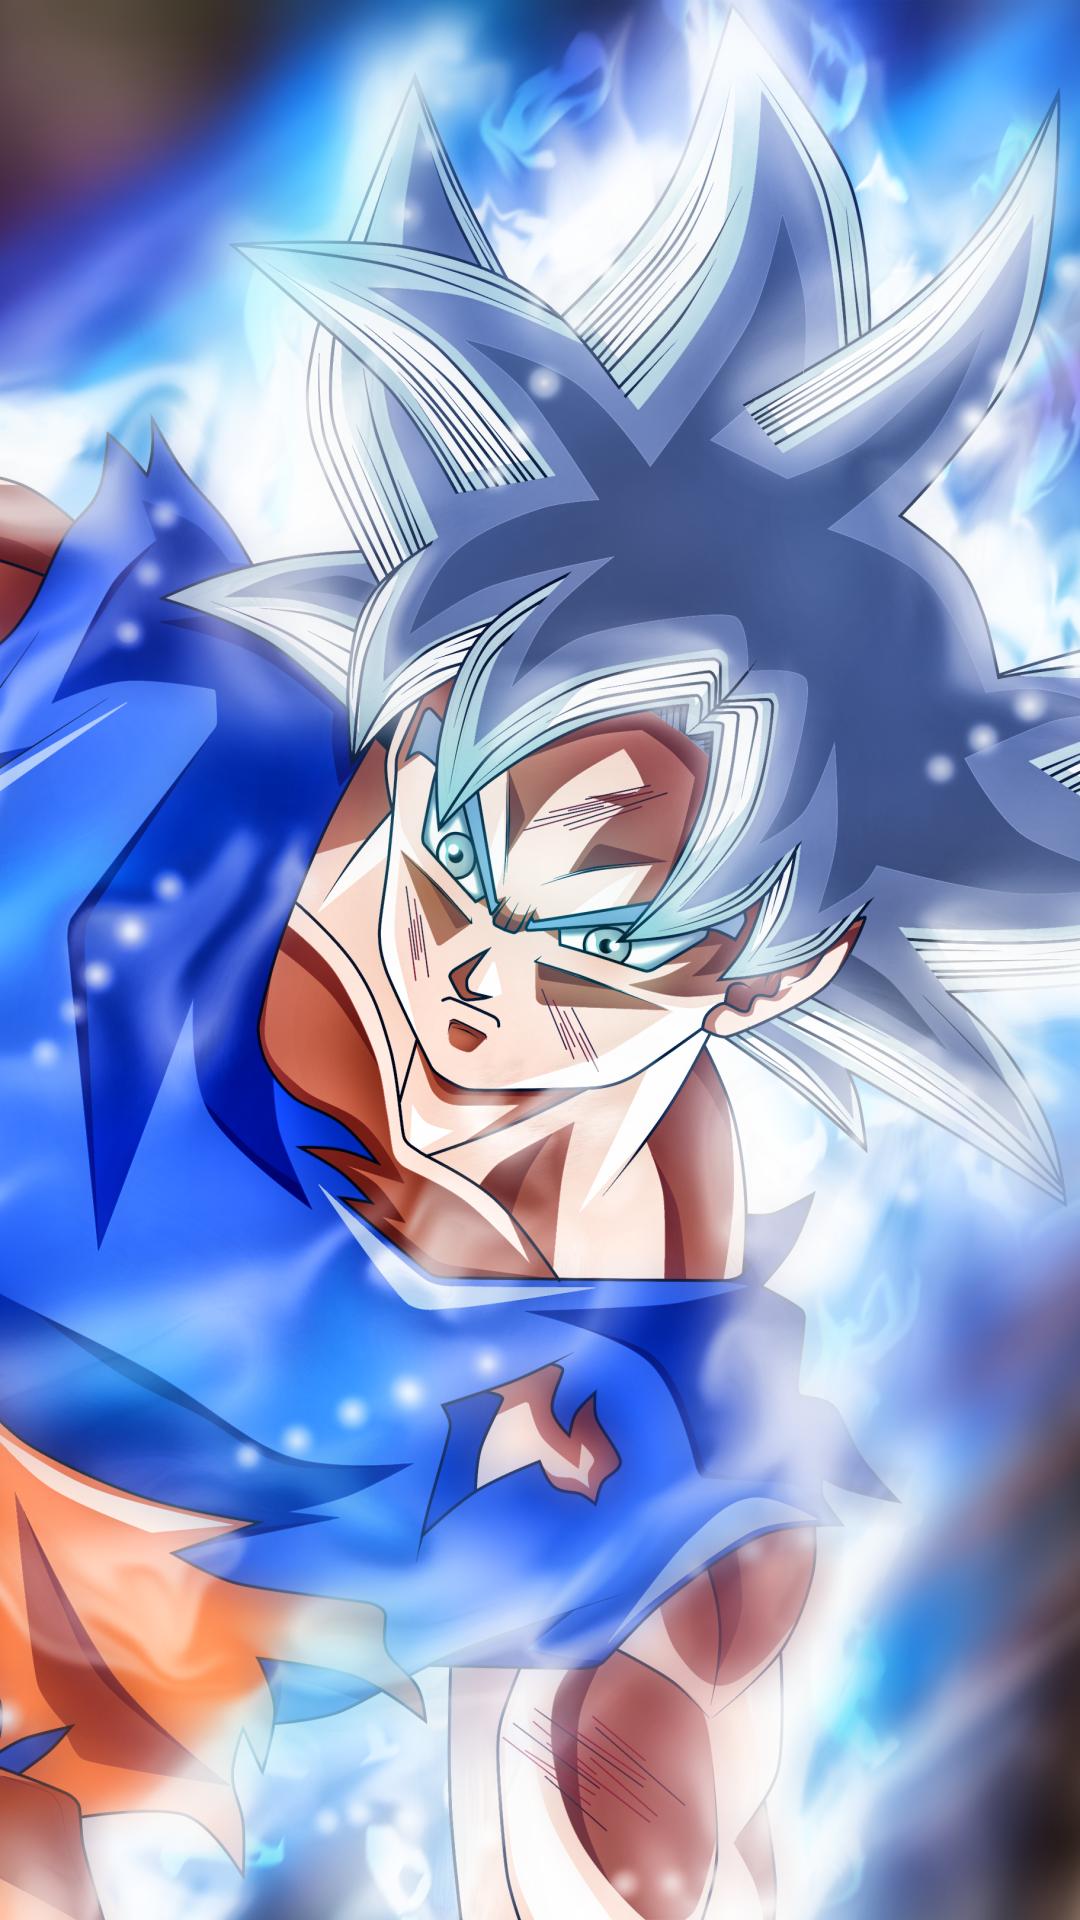 Anime Dragon Ball Super 1080x1920 Wallpaper Id 712131 Mobile